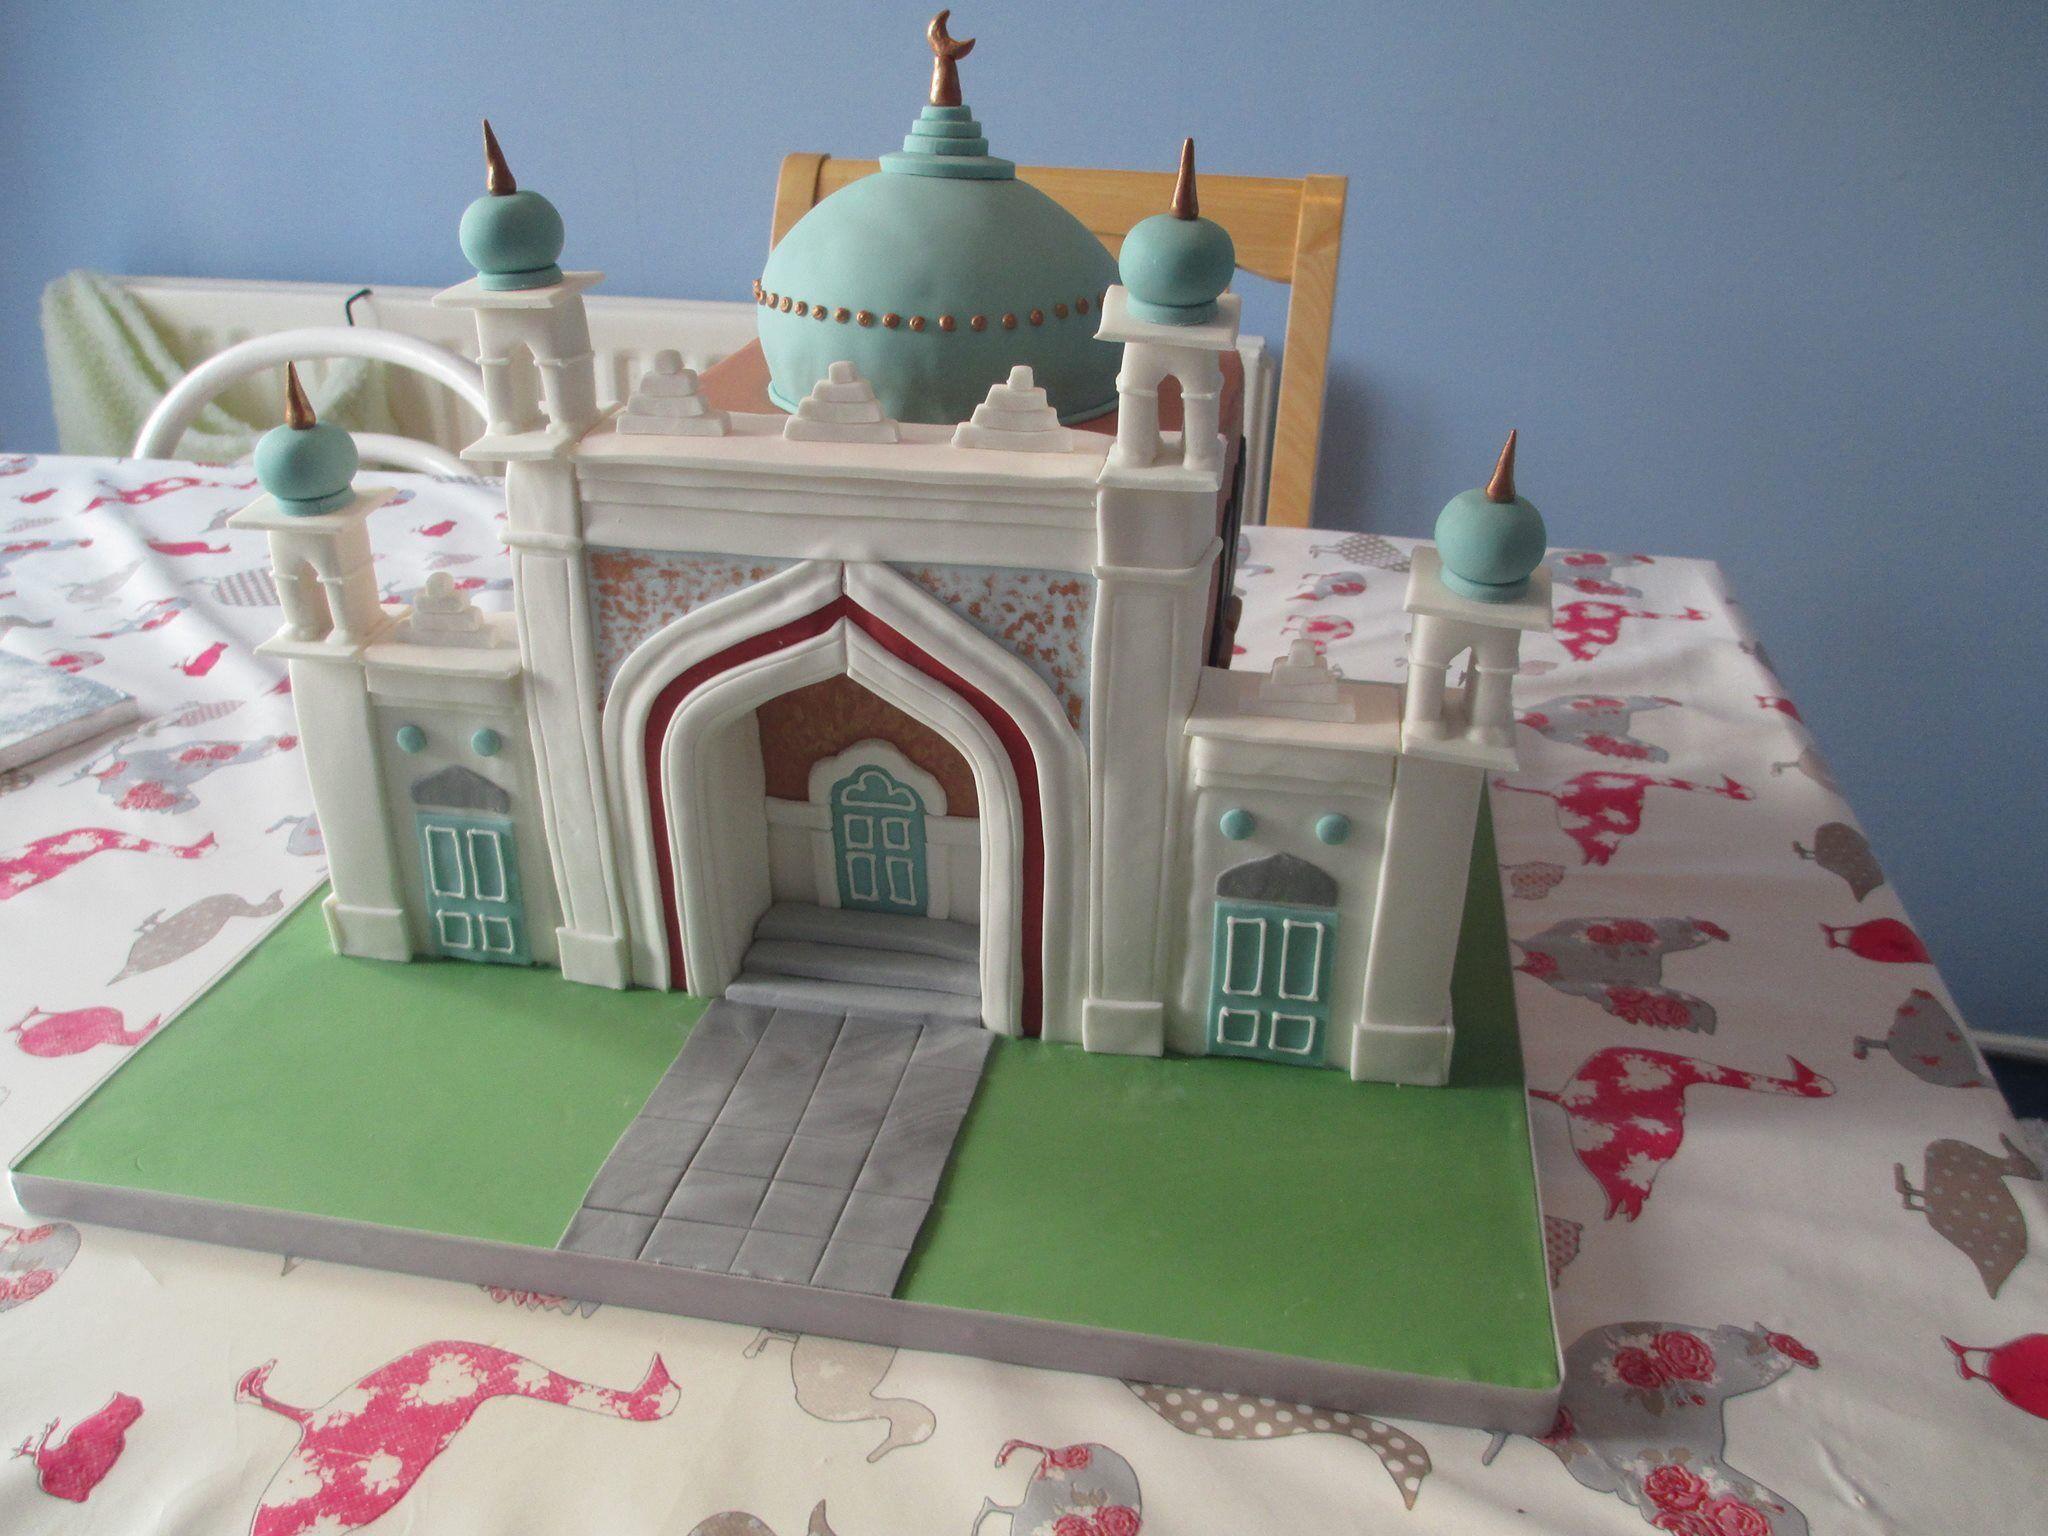 Epic Mosque cake TortenKaufenBilderEid